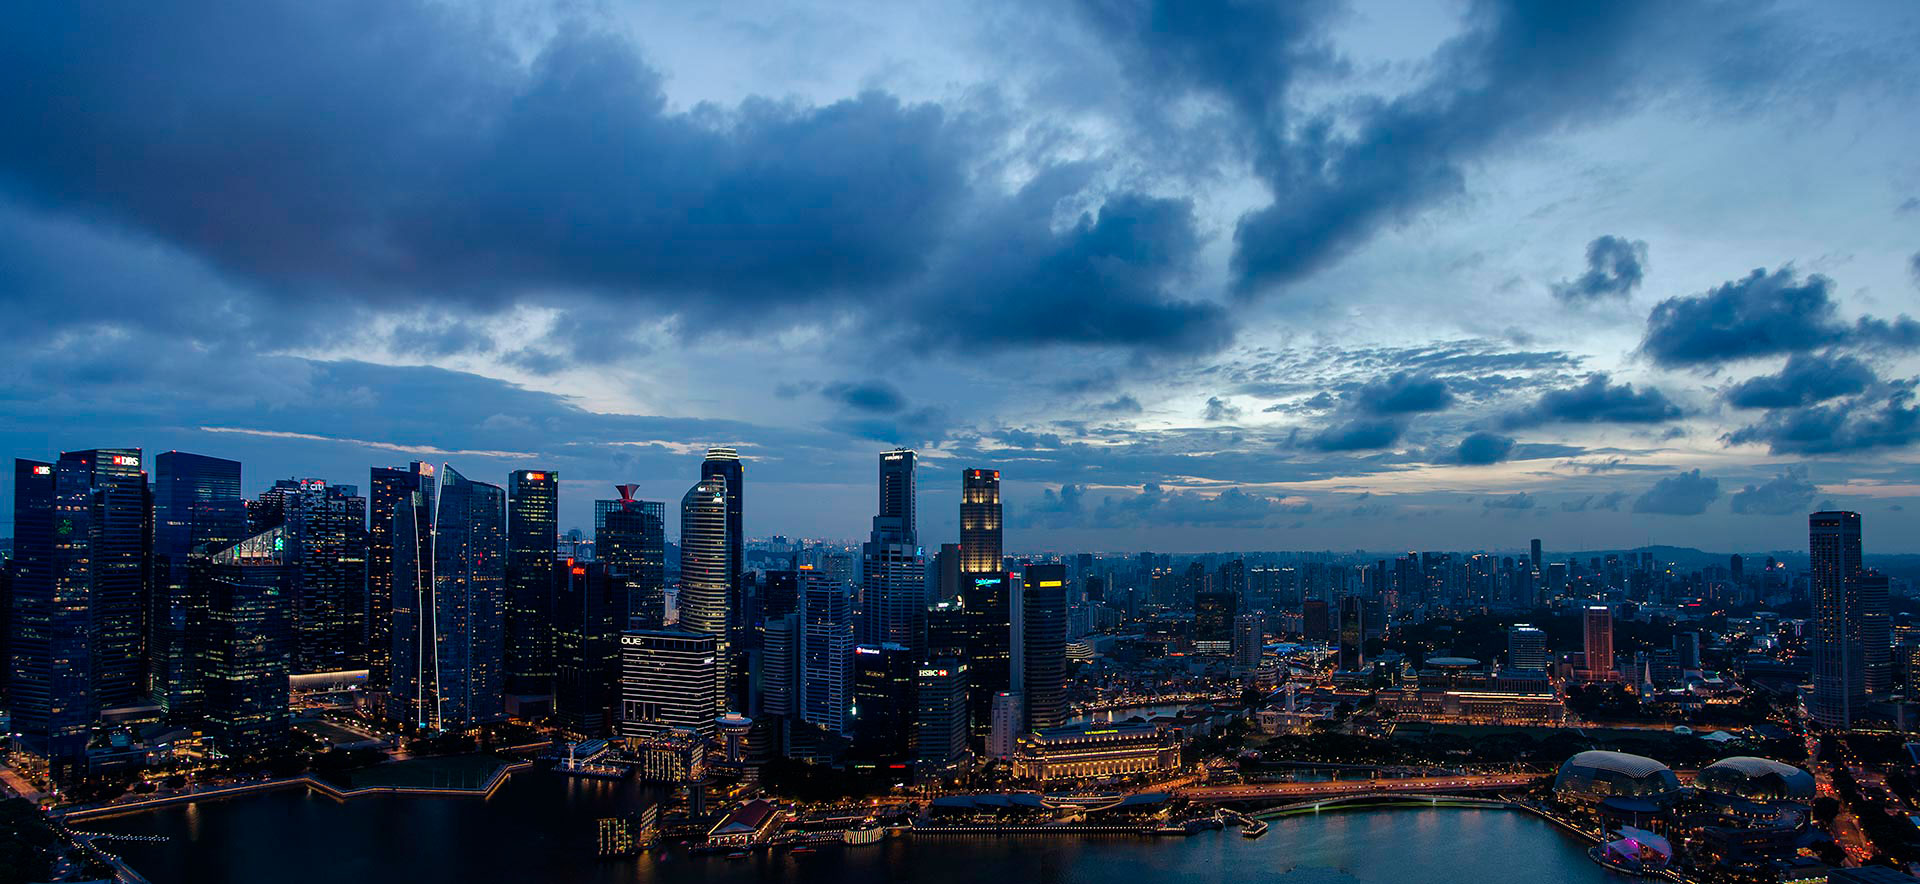 Architectuurfotografie avondfotografie nightphotography skyline Singapore